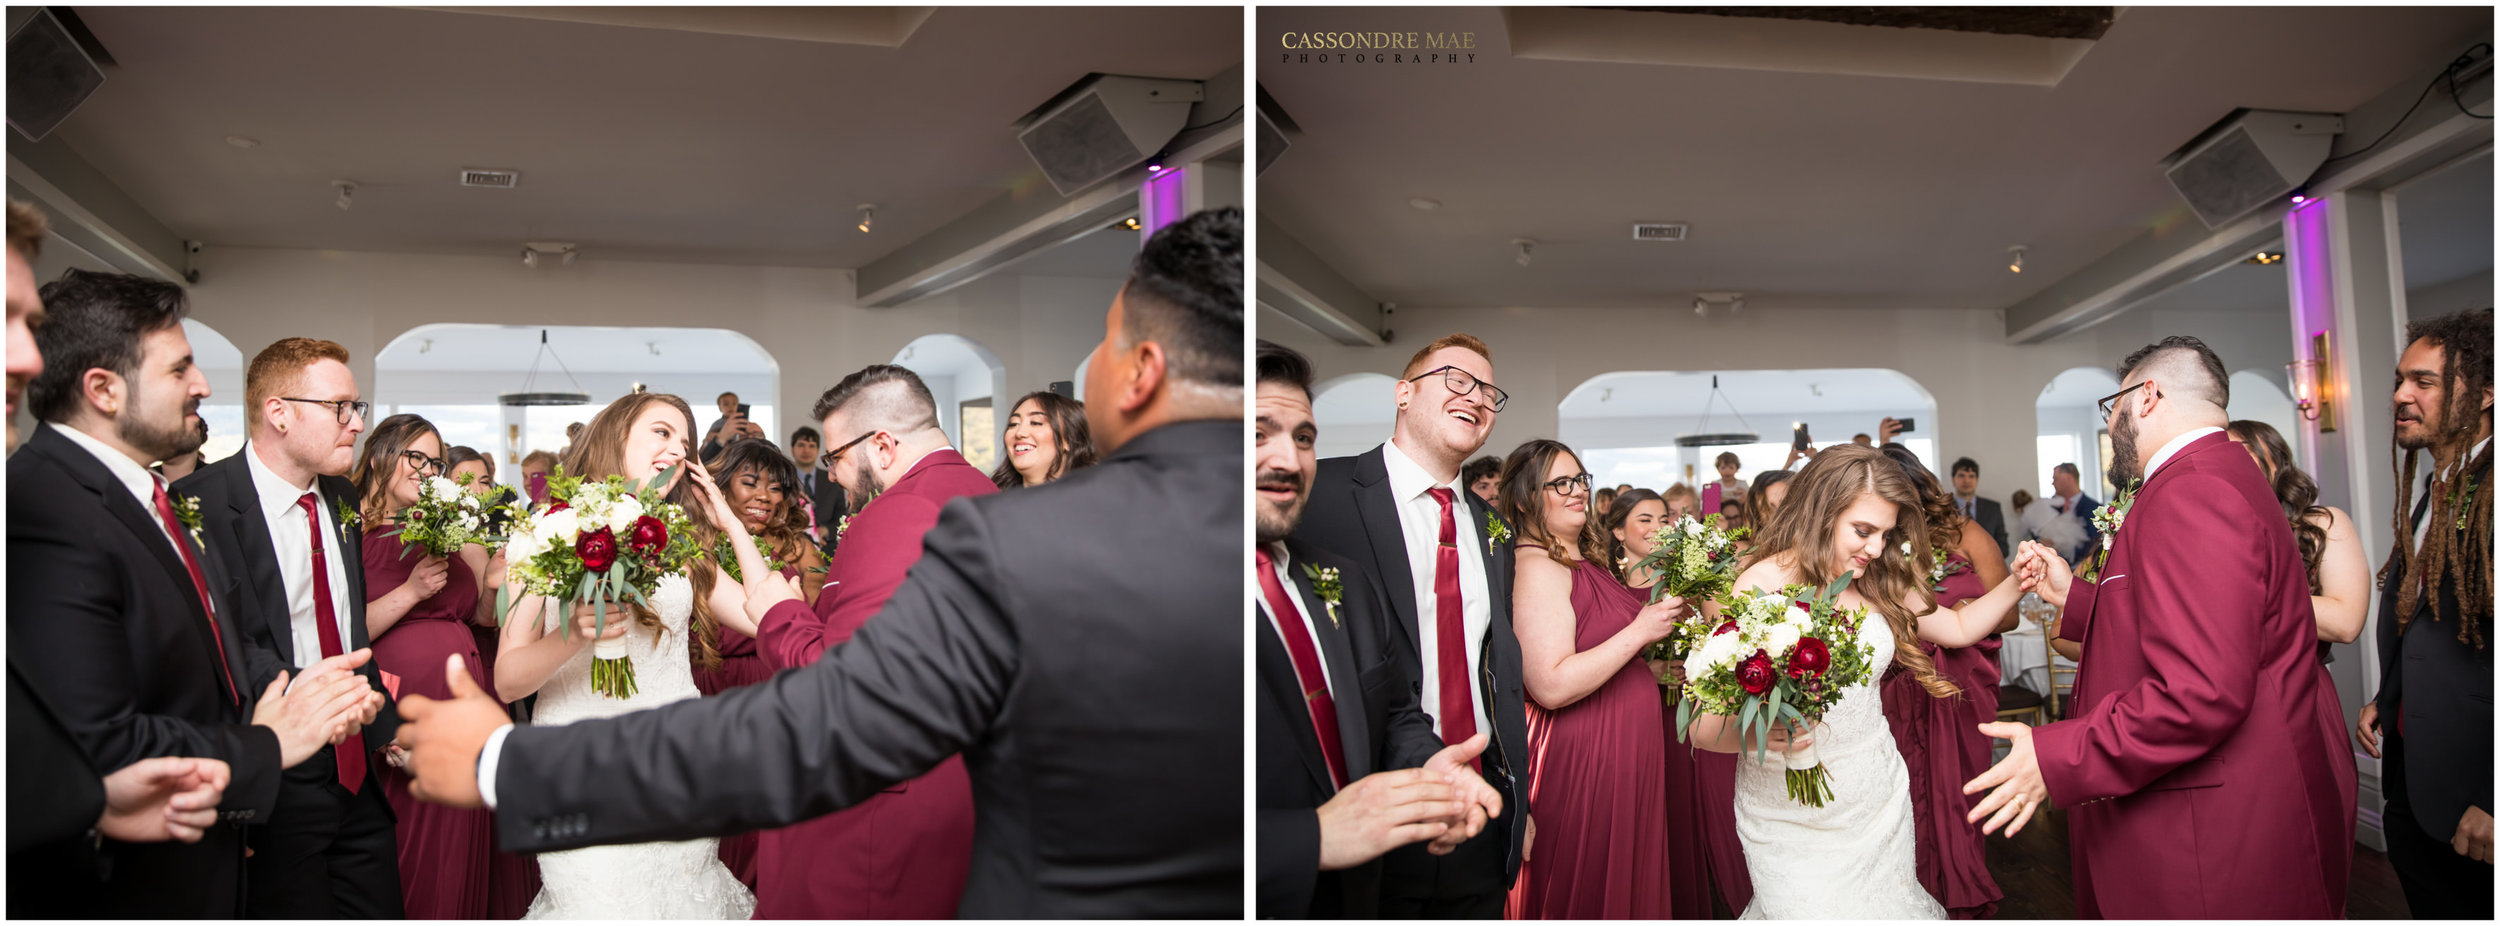 Cassondre Mae Photography Cove Castle Weddings 6.jpg